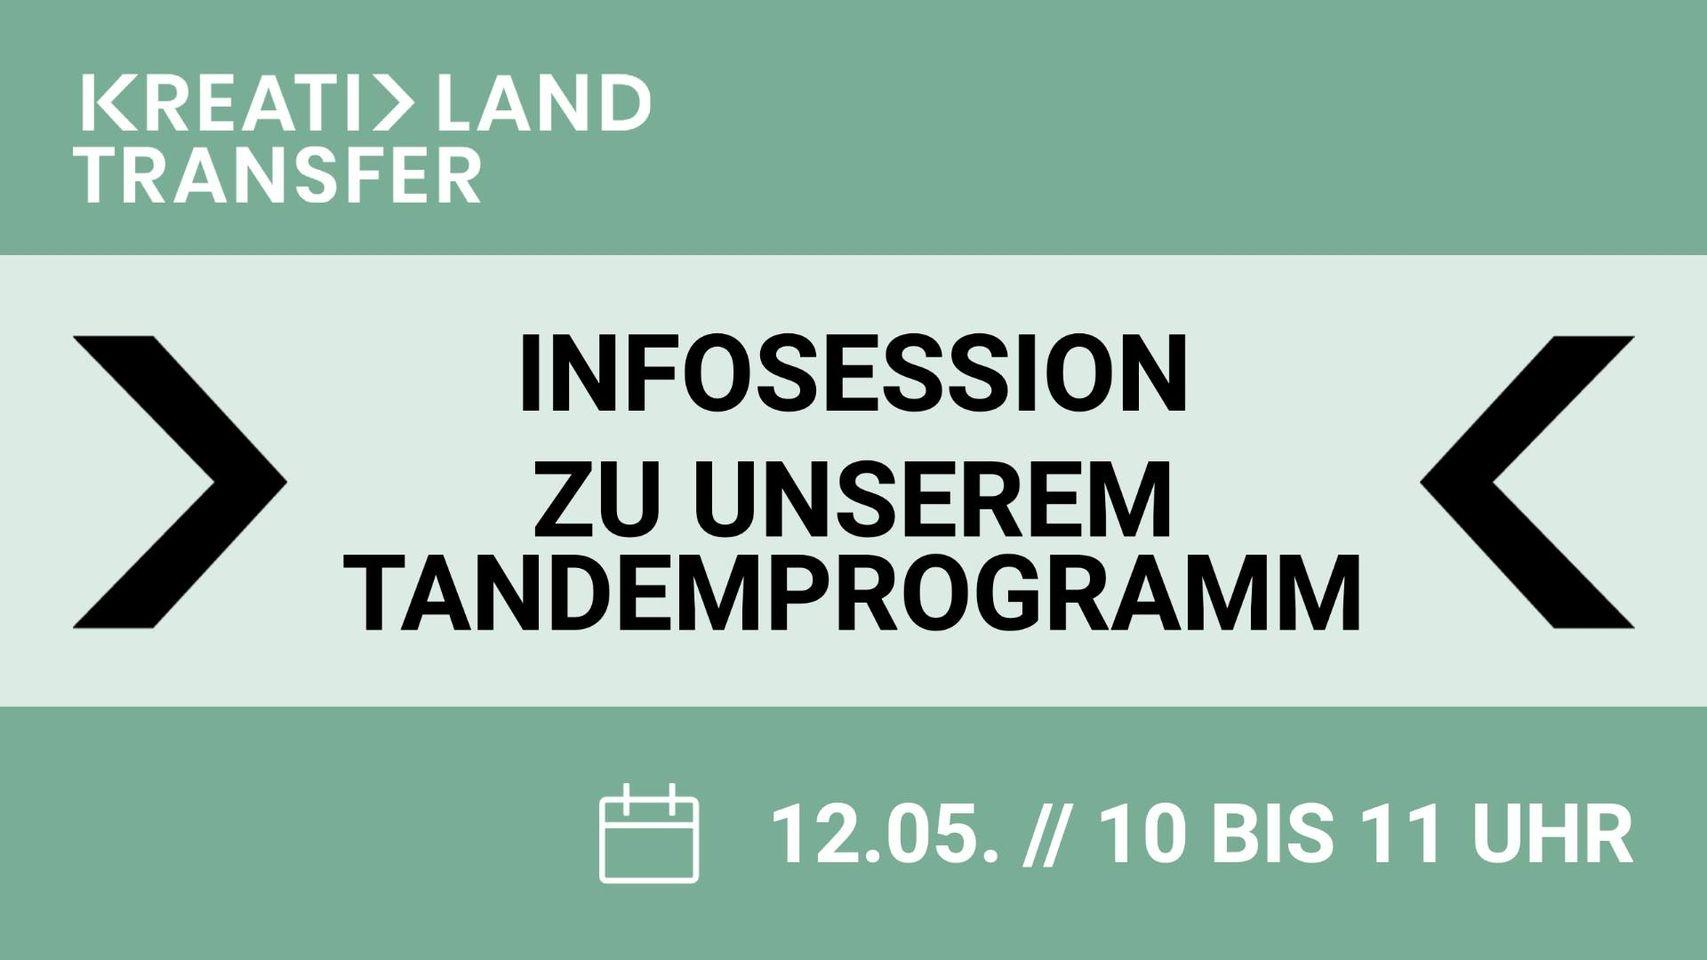 Infosession Tandemprogramm KreativLandTransfer